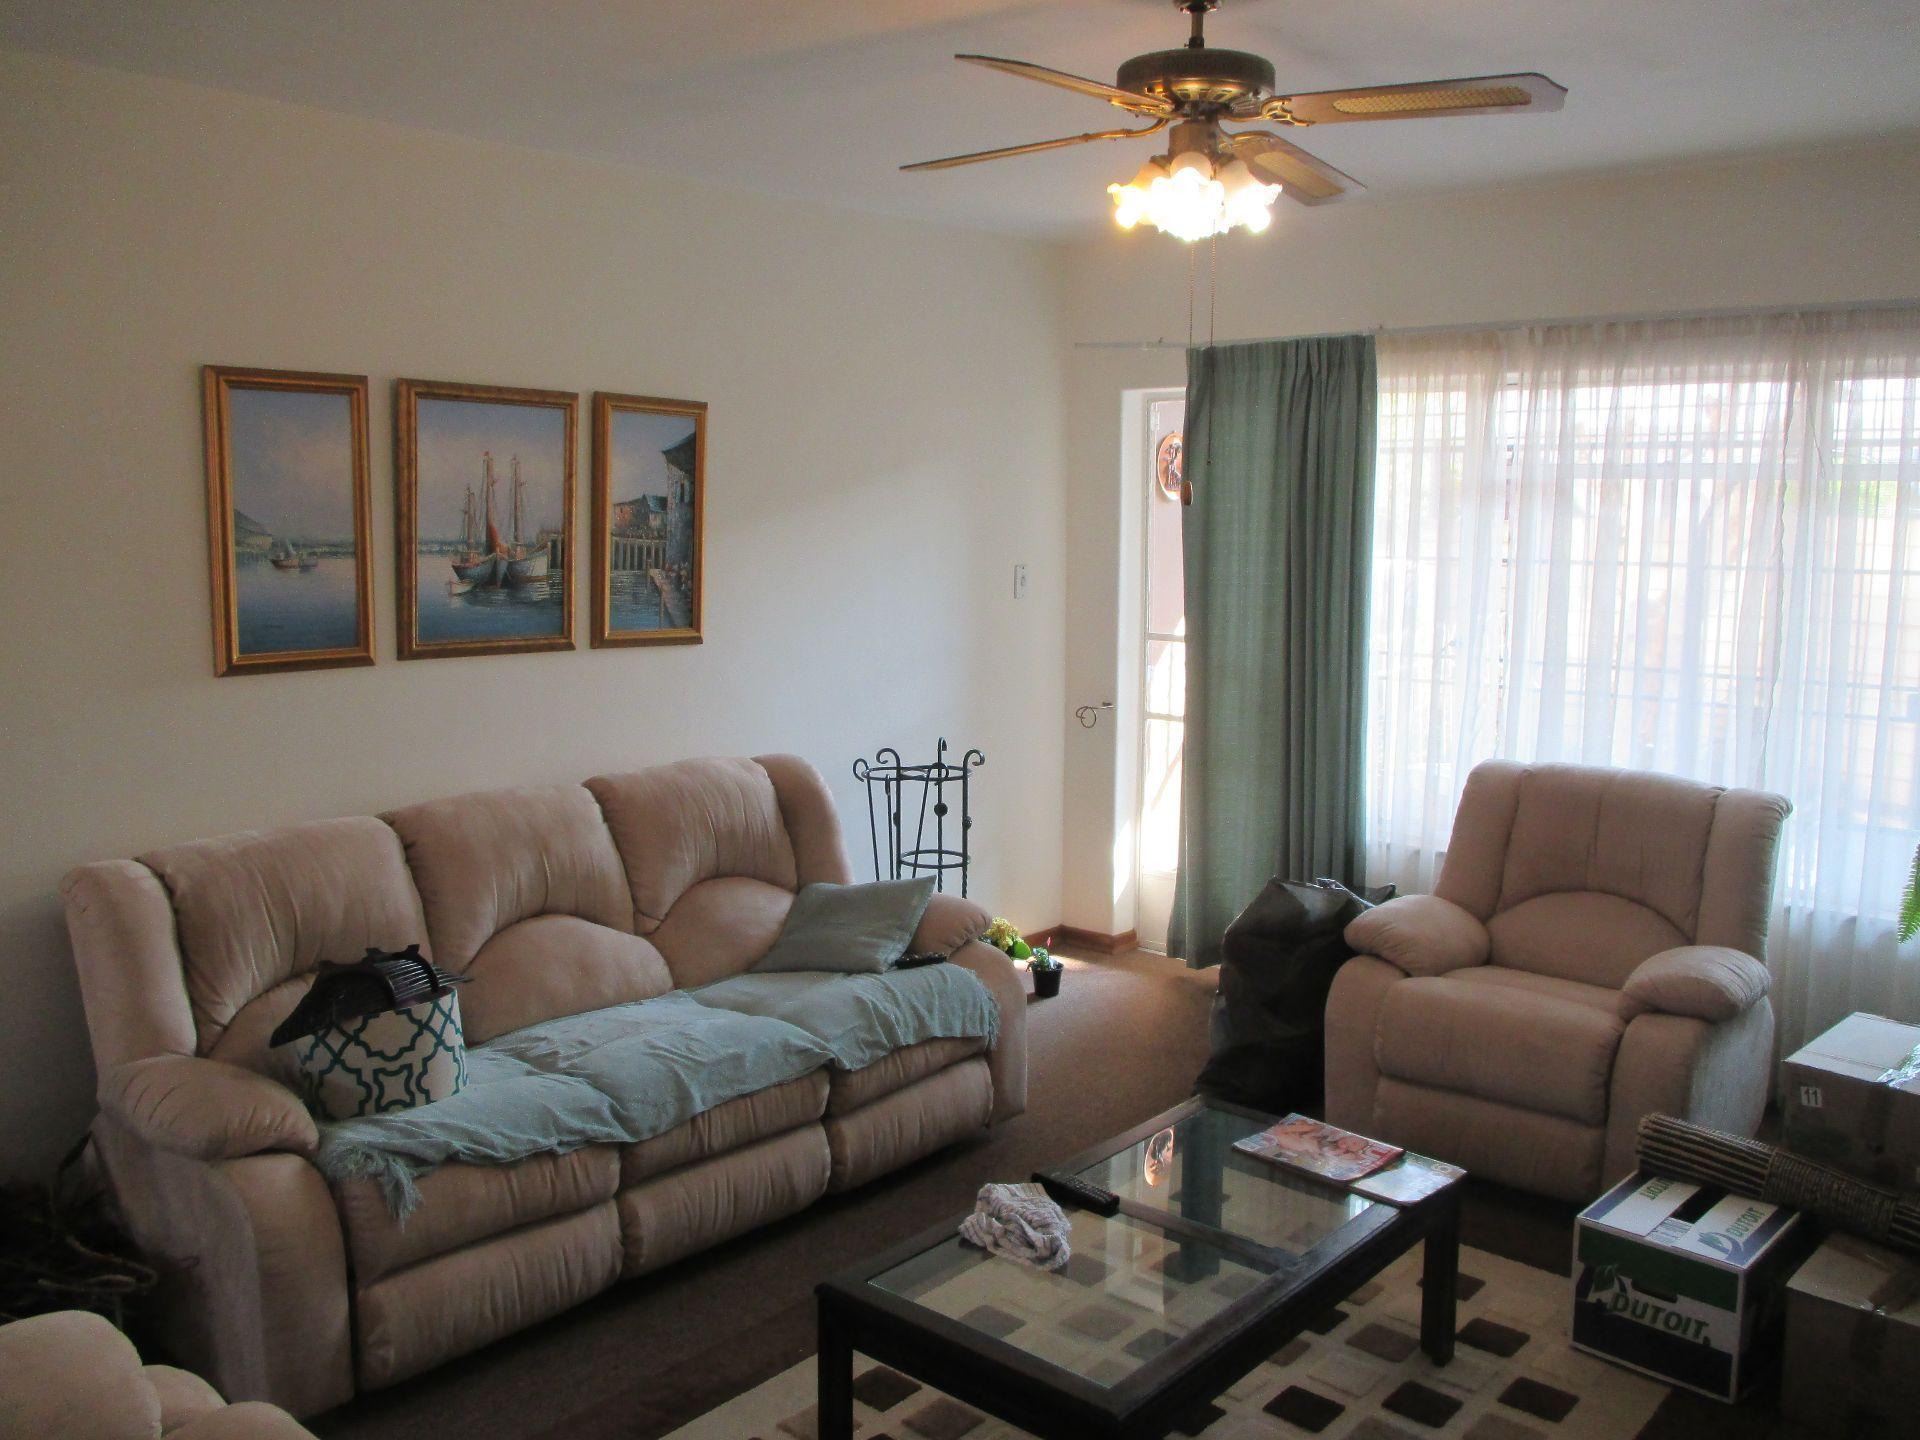 Baillie Park property for sale. Ref No: 13486345. Picture no 4